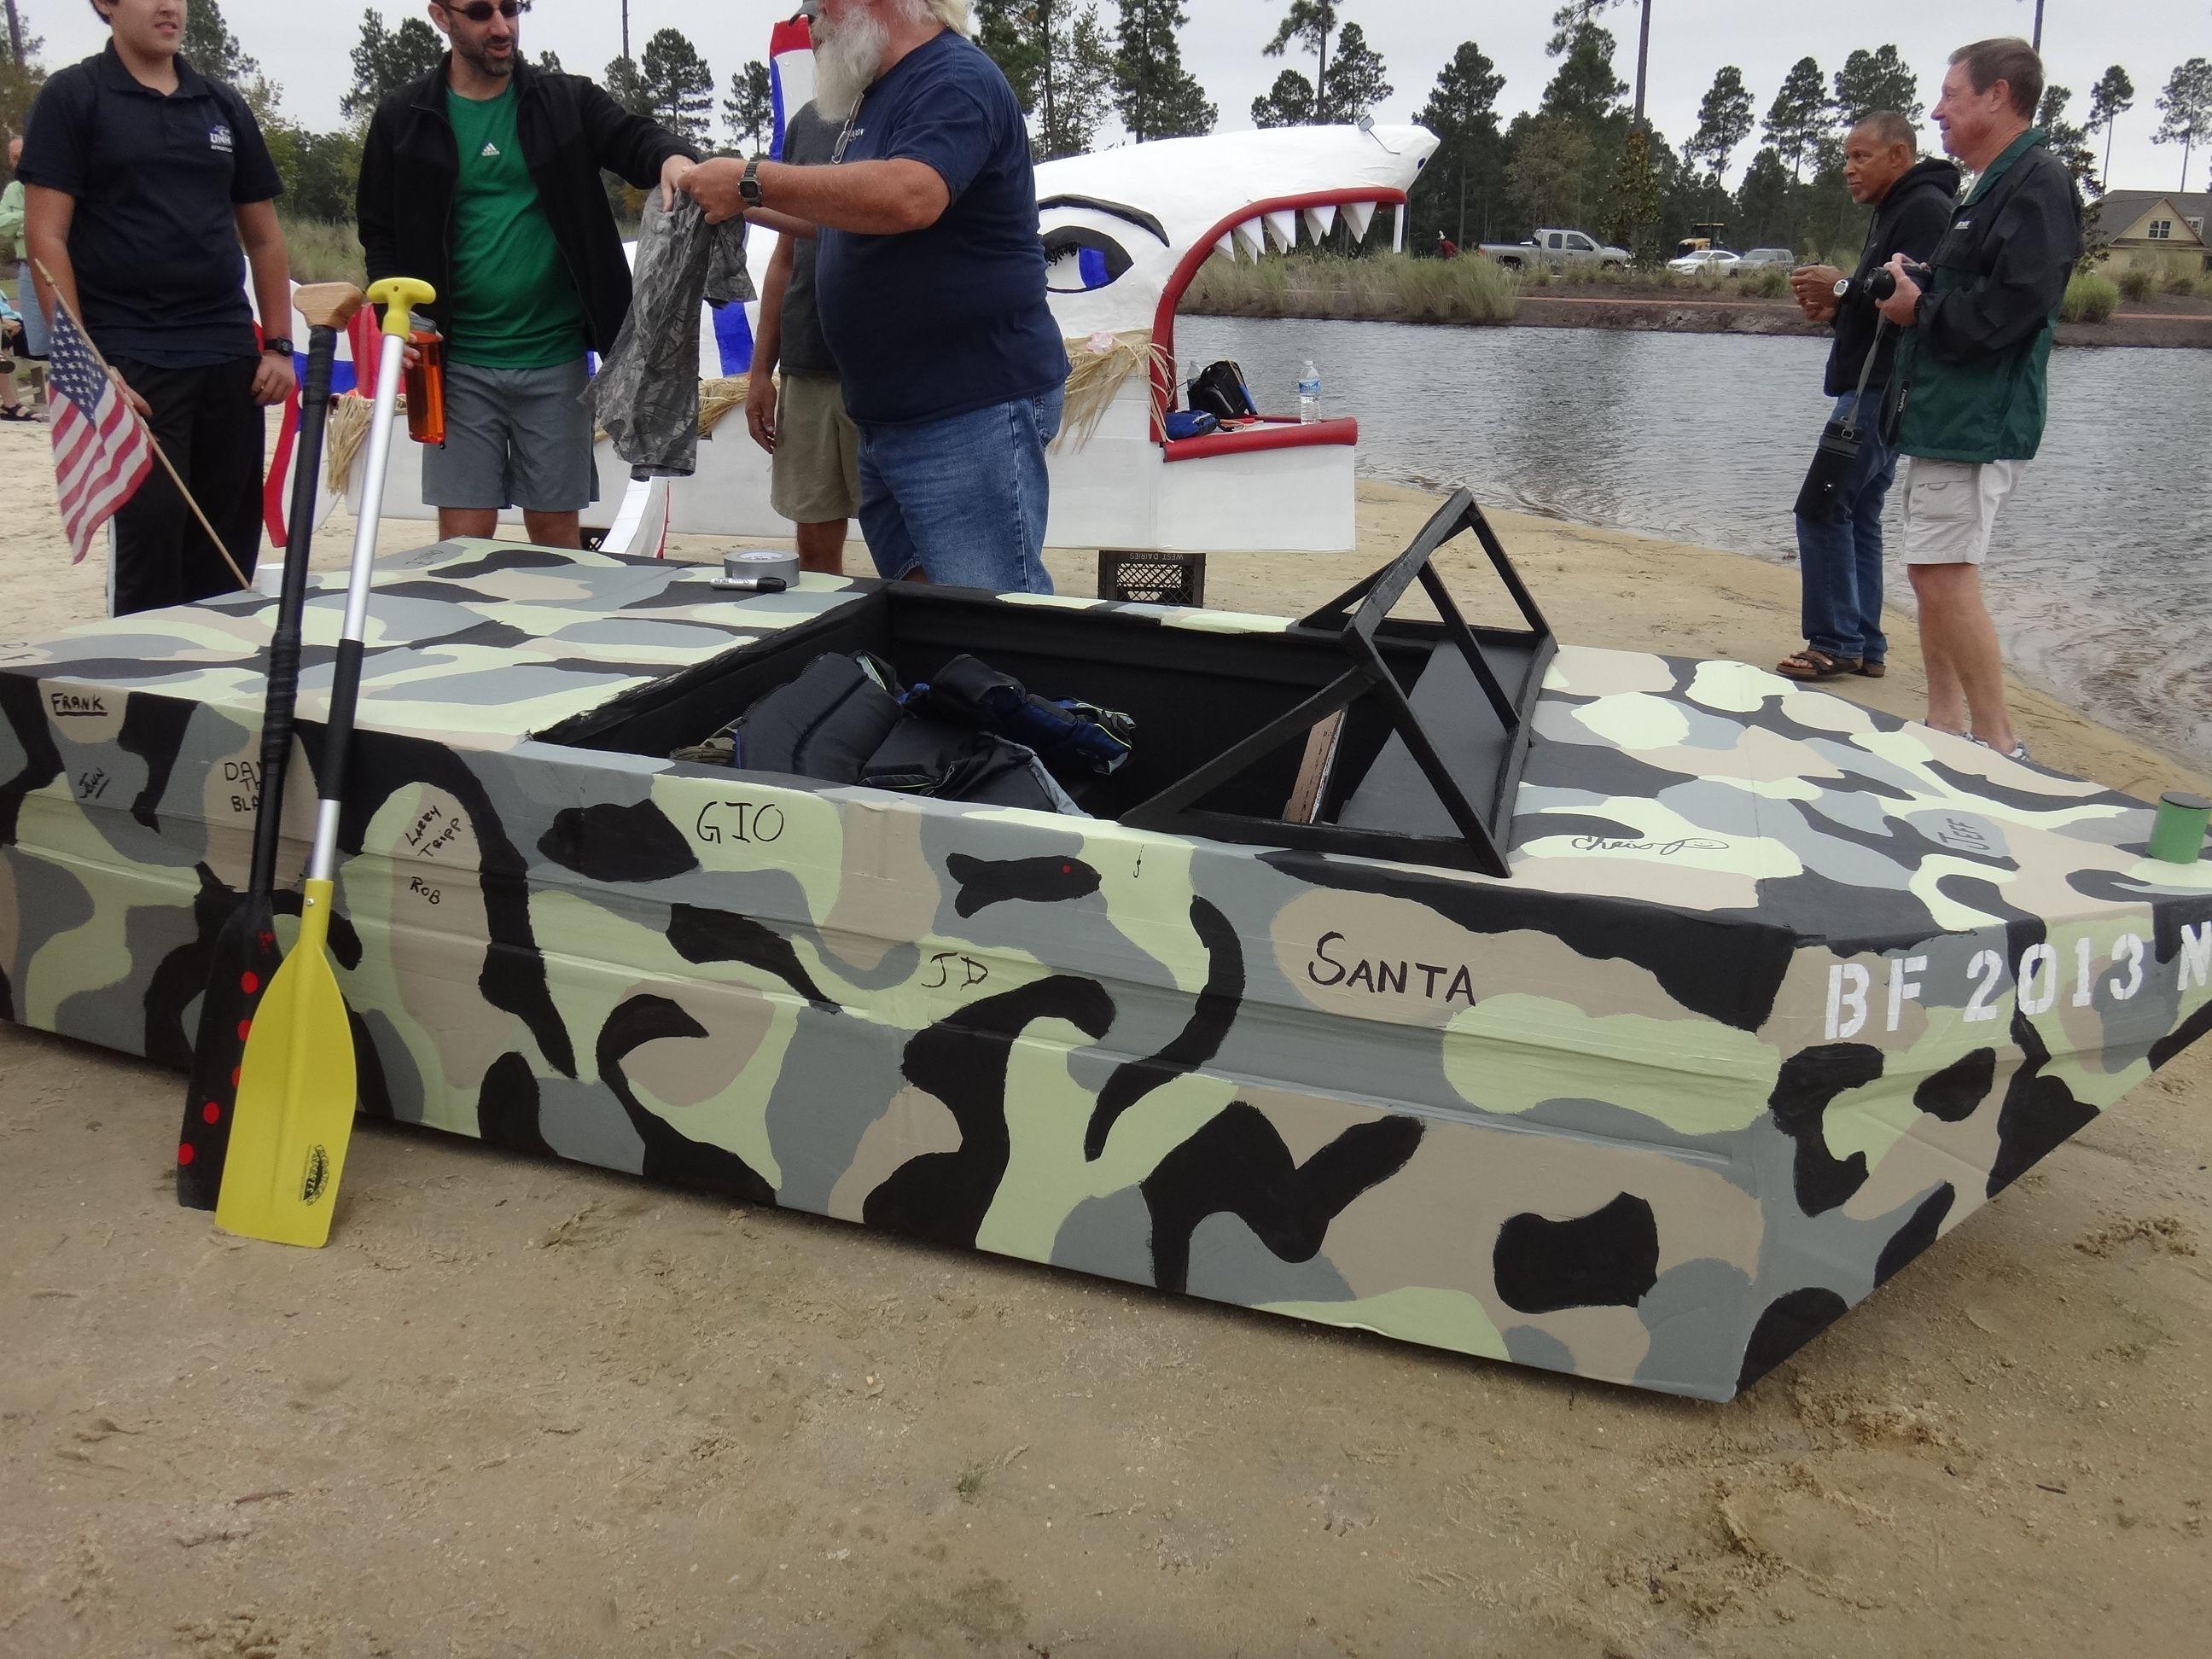 2013 Hammock Lake Cardboard Boat Race